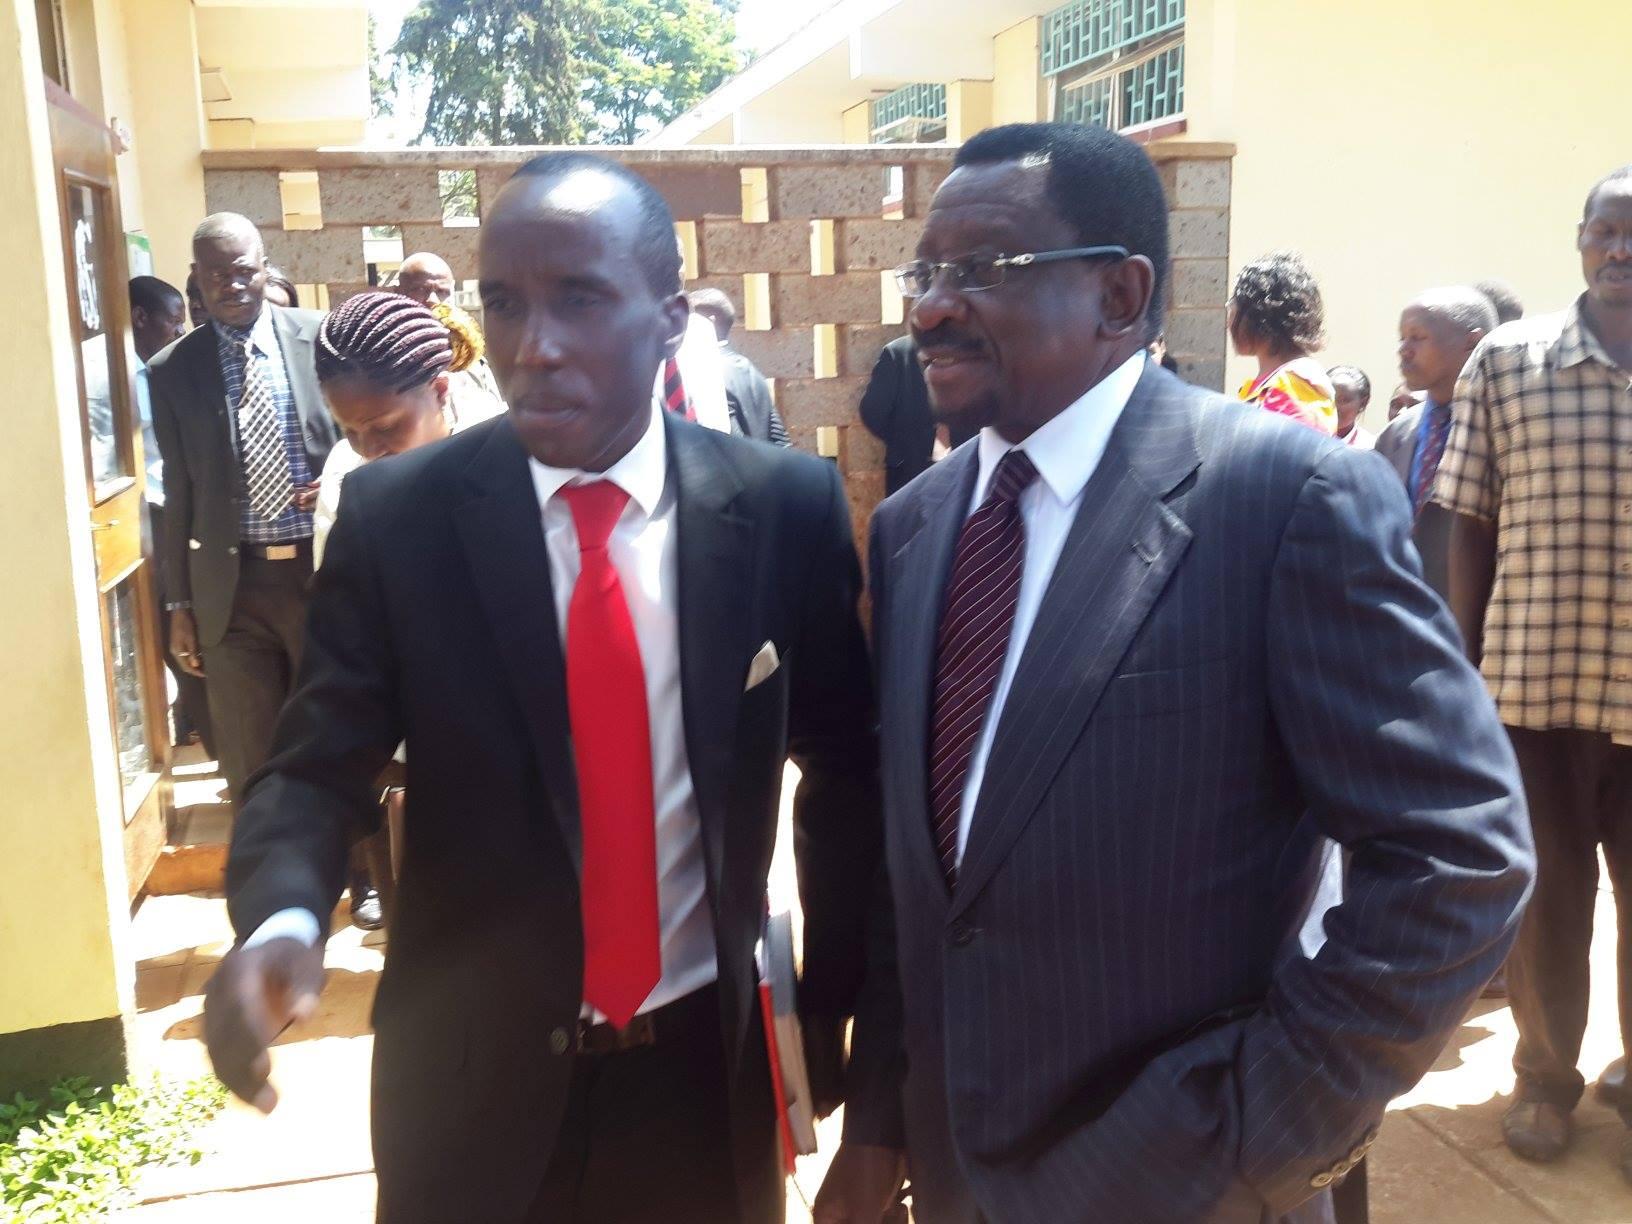 BREAKING: Senior Counsel James Orengo GETS Robert Alai out on 200K cash bail bond